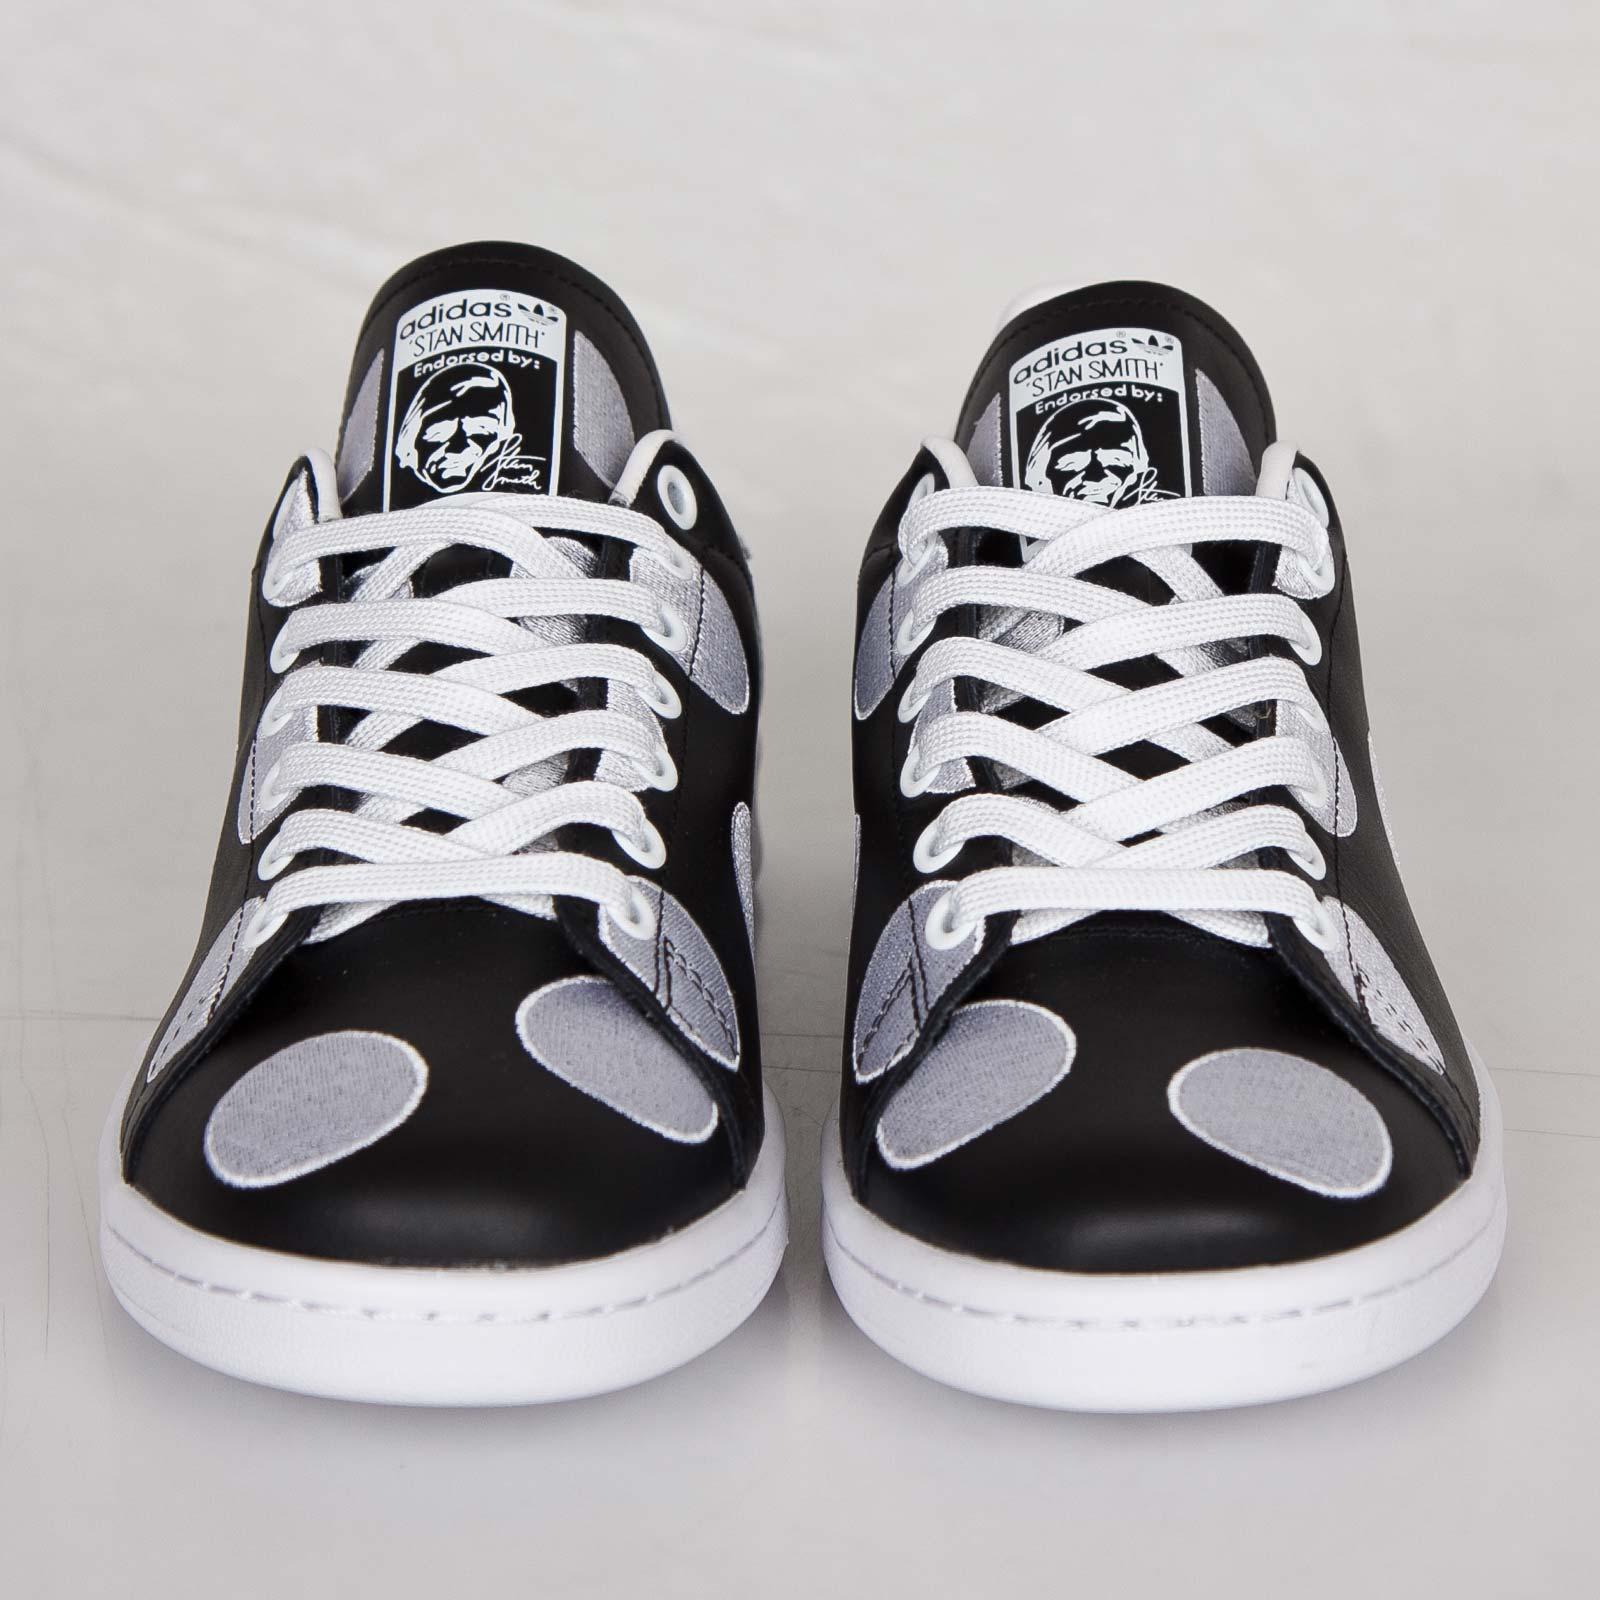 085a5361a adidas PW Stan Smith BPD - B25397 - Sneakersnstuff